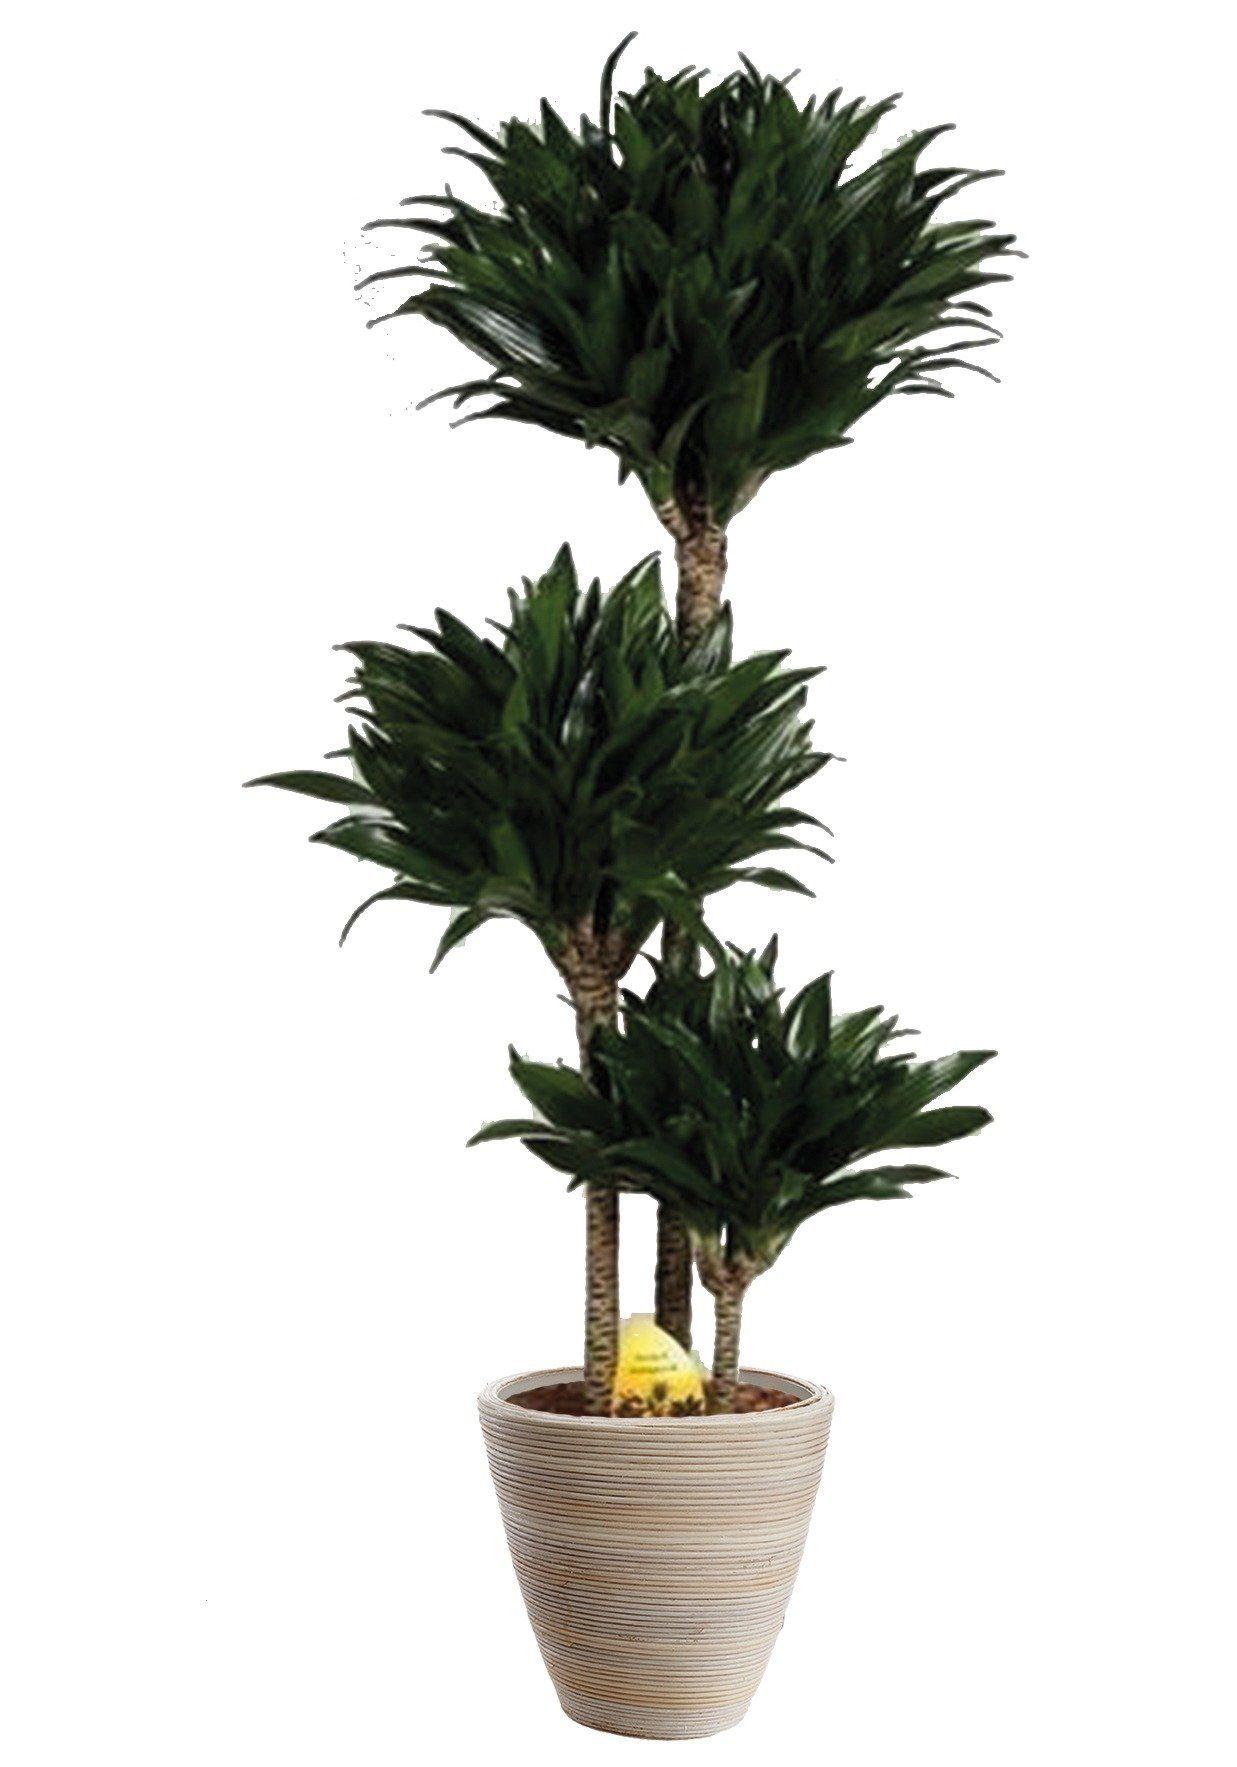 Zimmerpflanze »Drachenbaum Compacta«, 45 cm